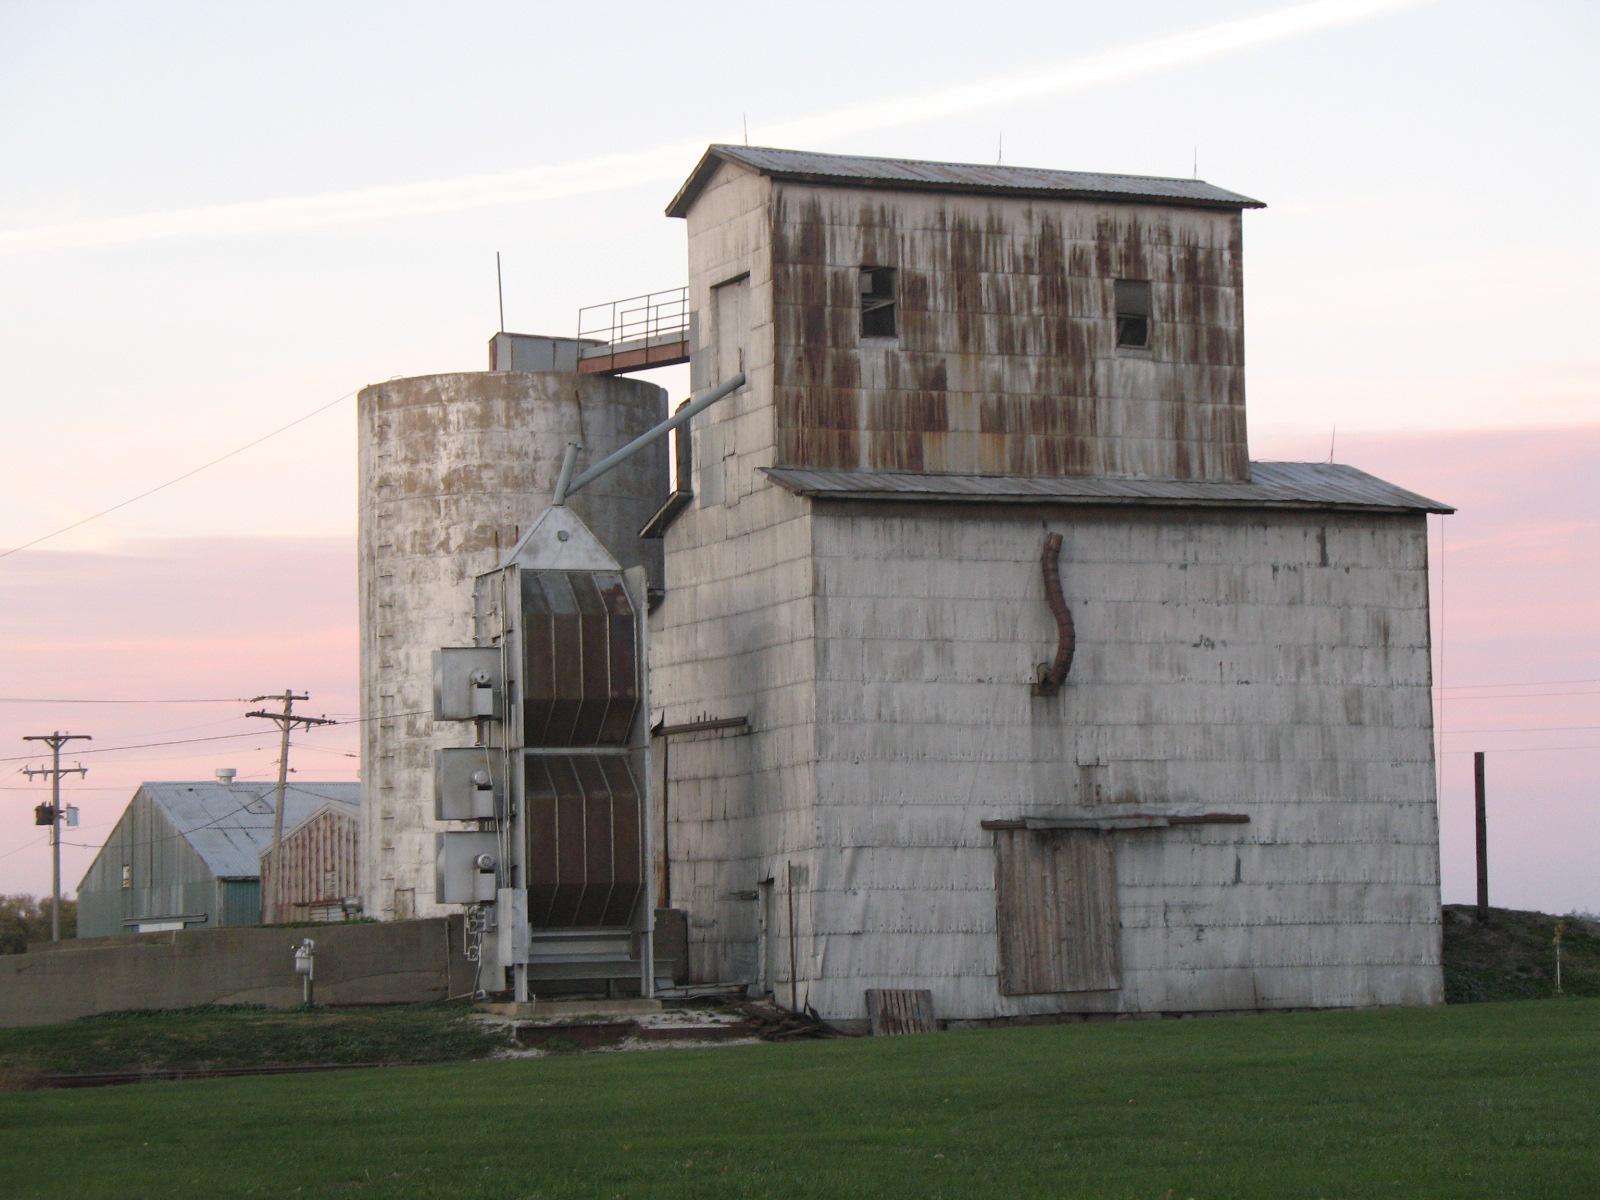 Illinois vermilion county armstrong - Illinois Vermilion County Armstrong 80